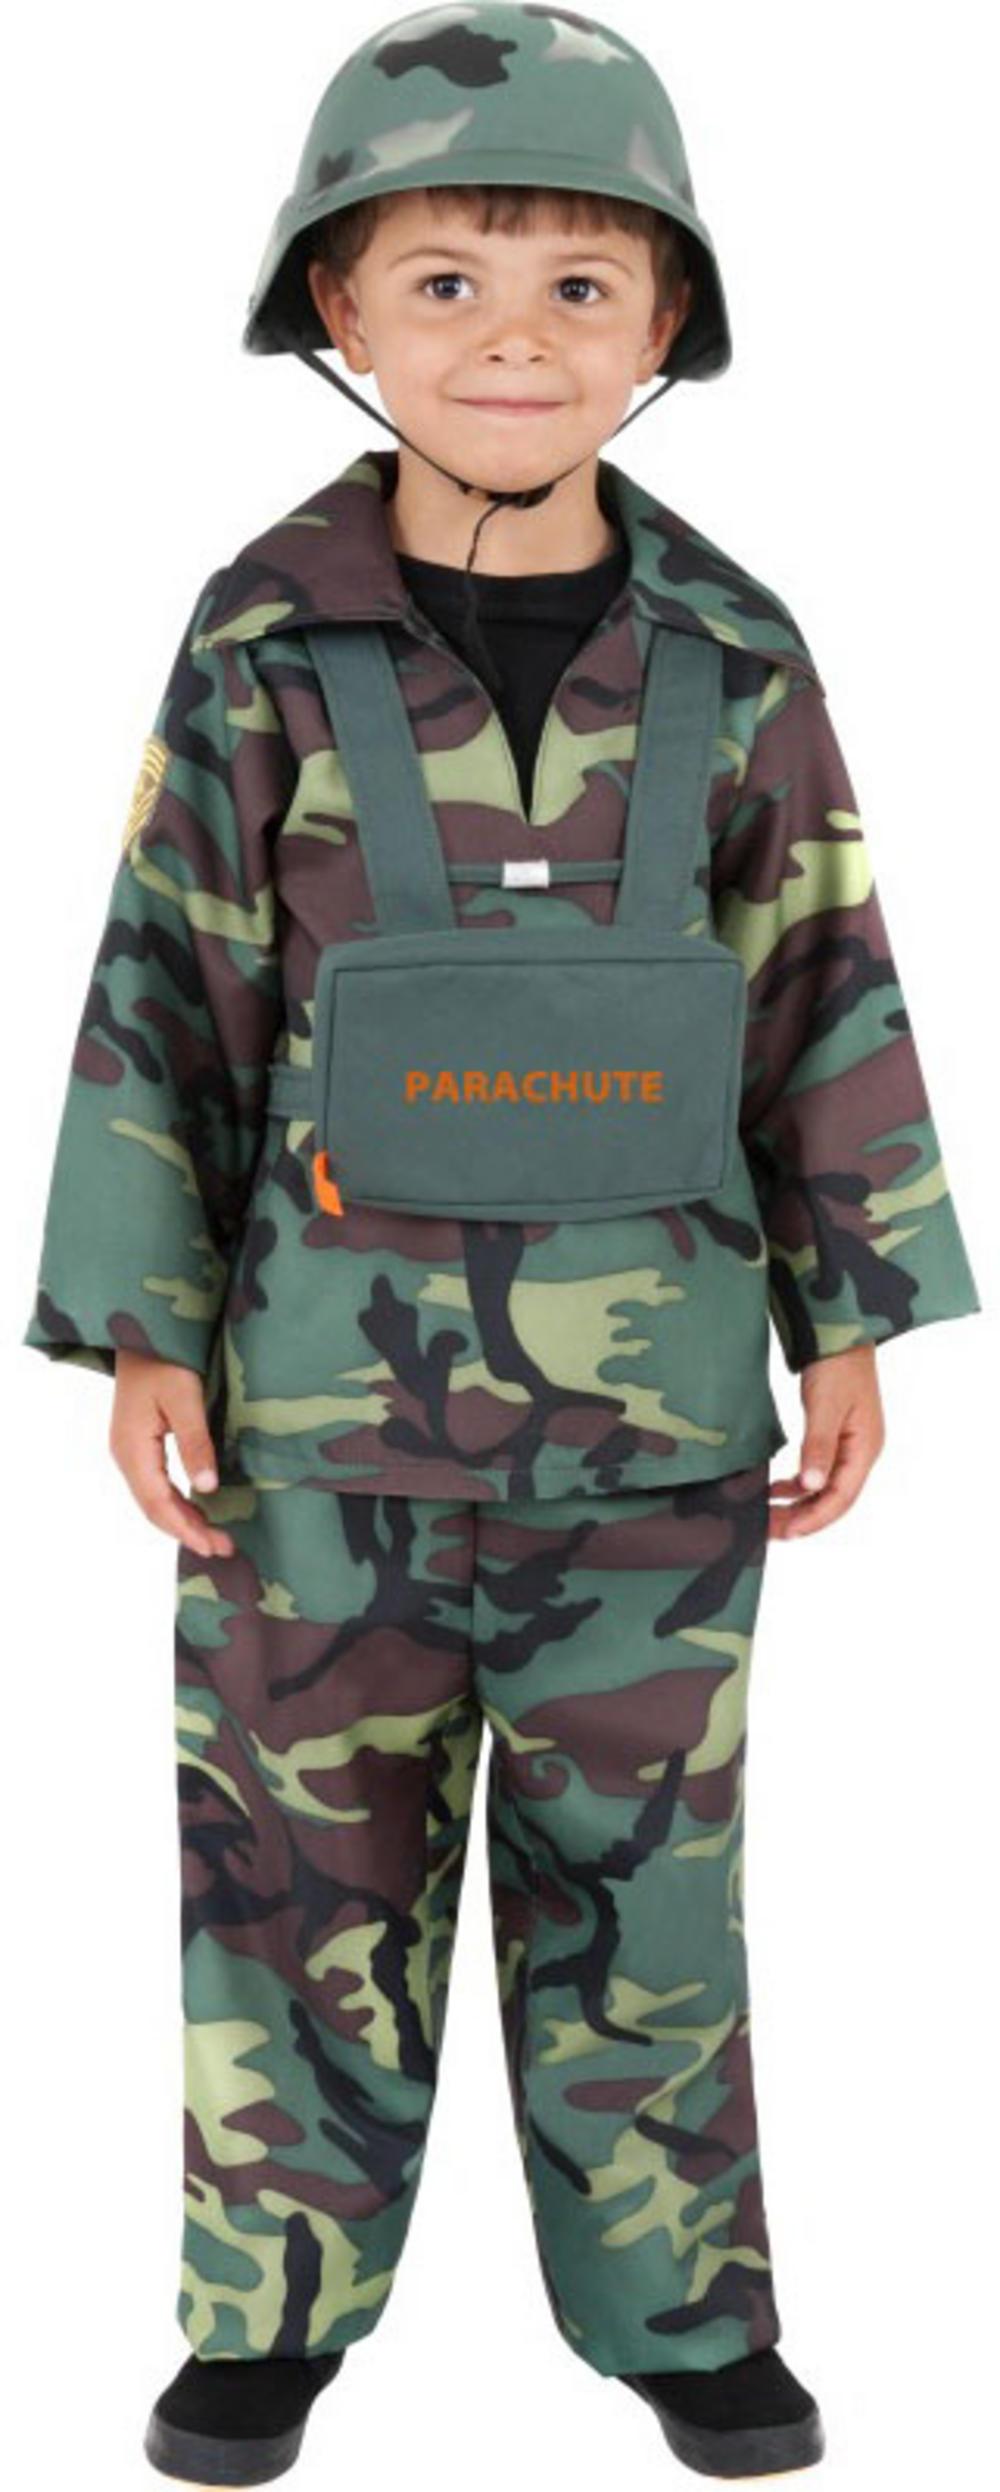 Kid's Military and Uniform Fancy Dress Costumes | Mega Fancy